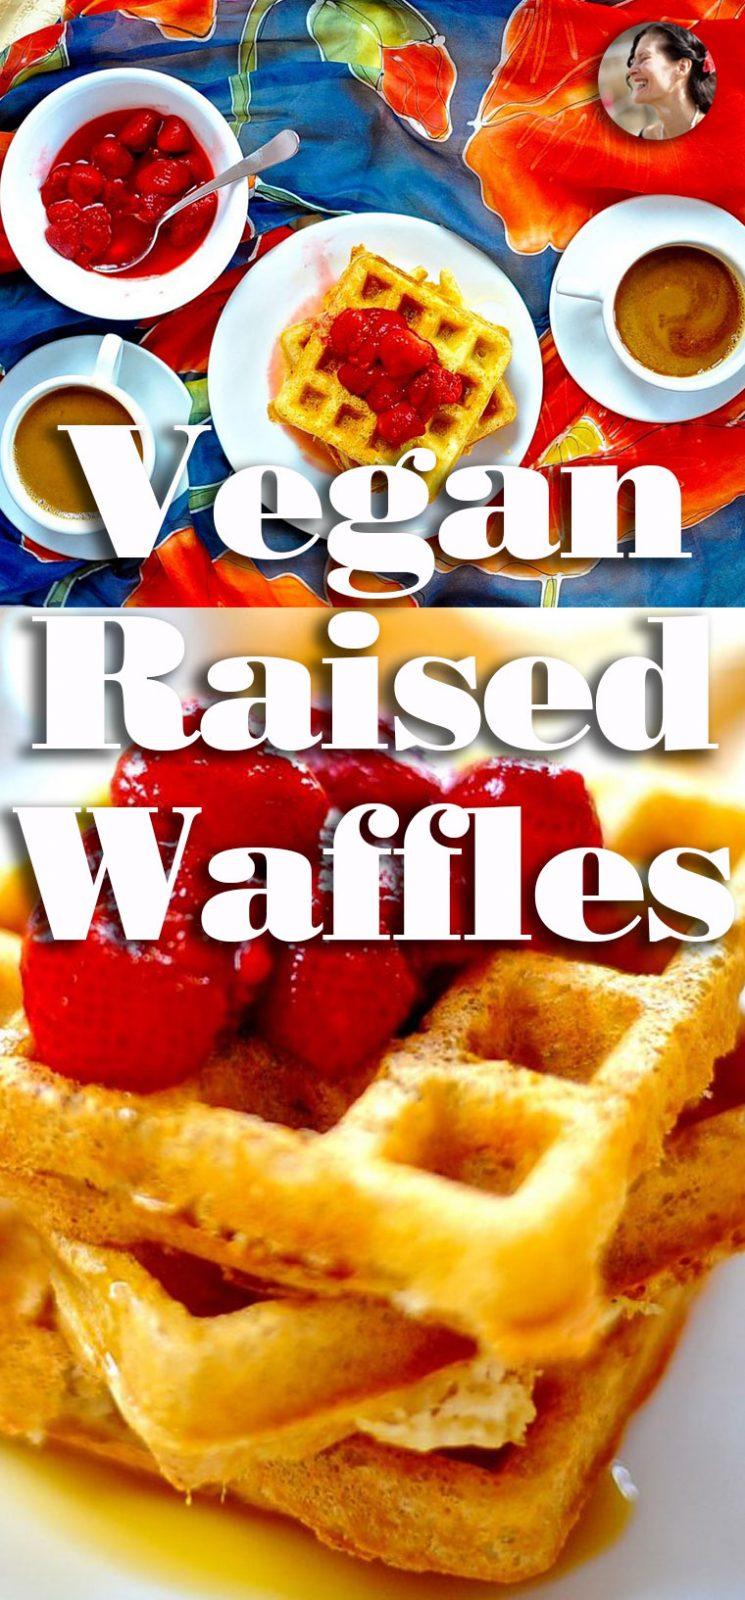 Vegan Raised Waffles